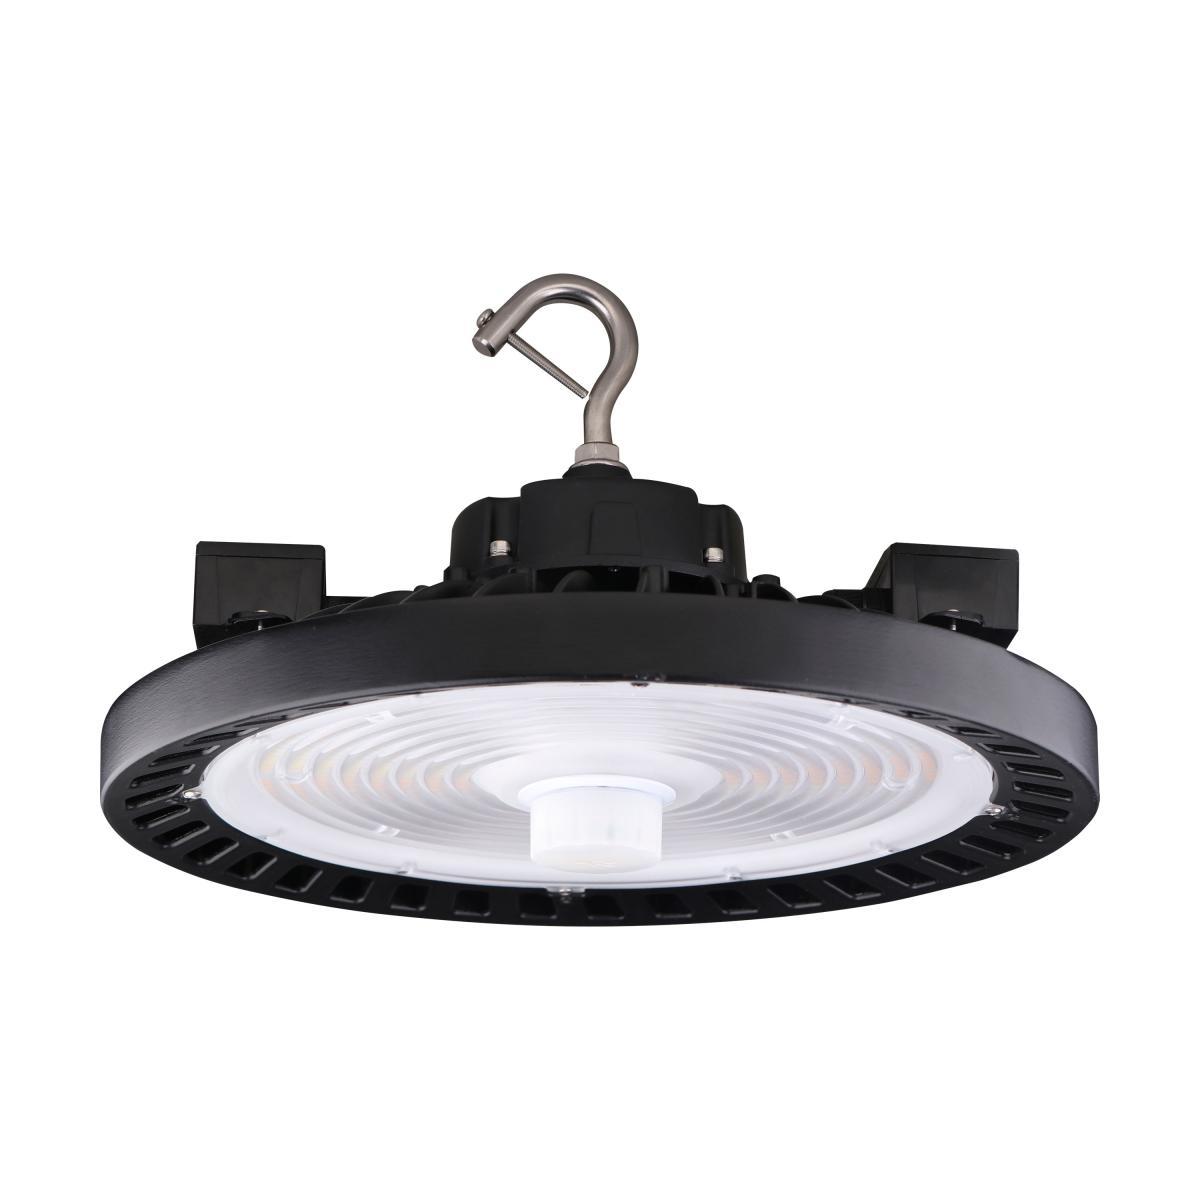 65-770 LED UFO HIGHBAY CCT & WATT ADJ